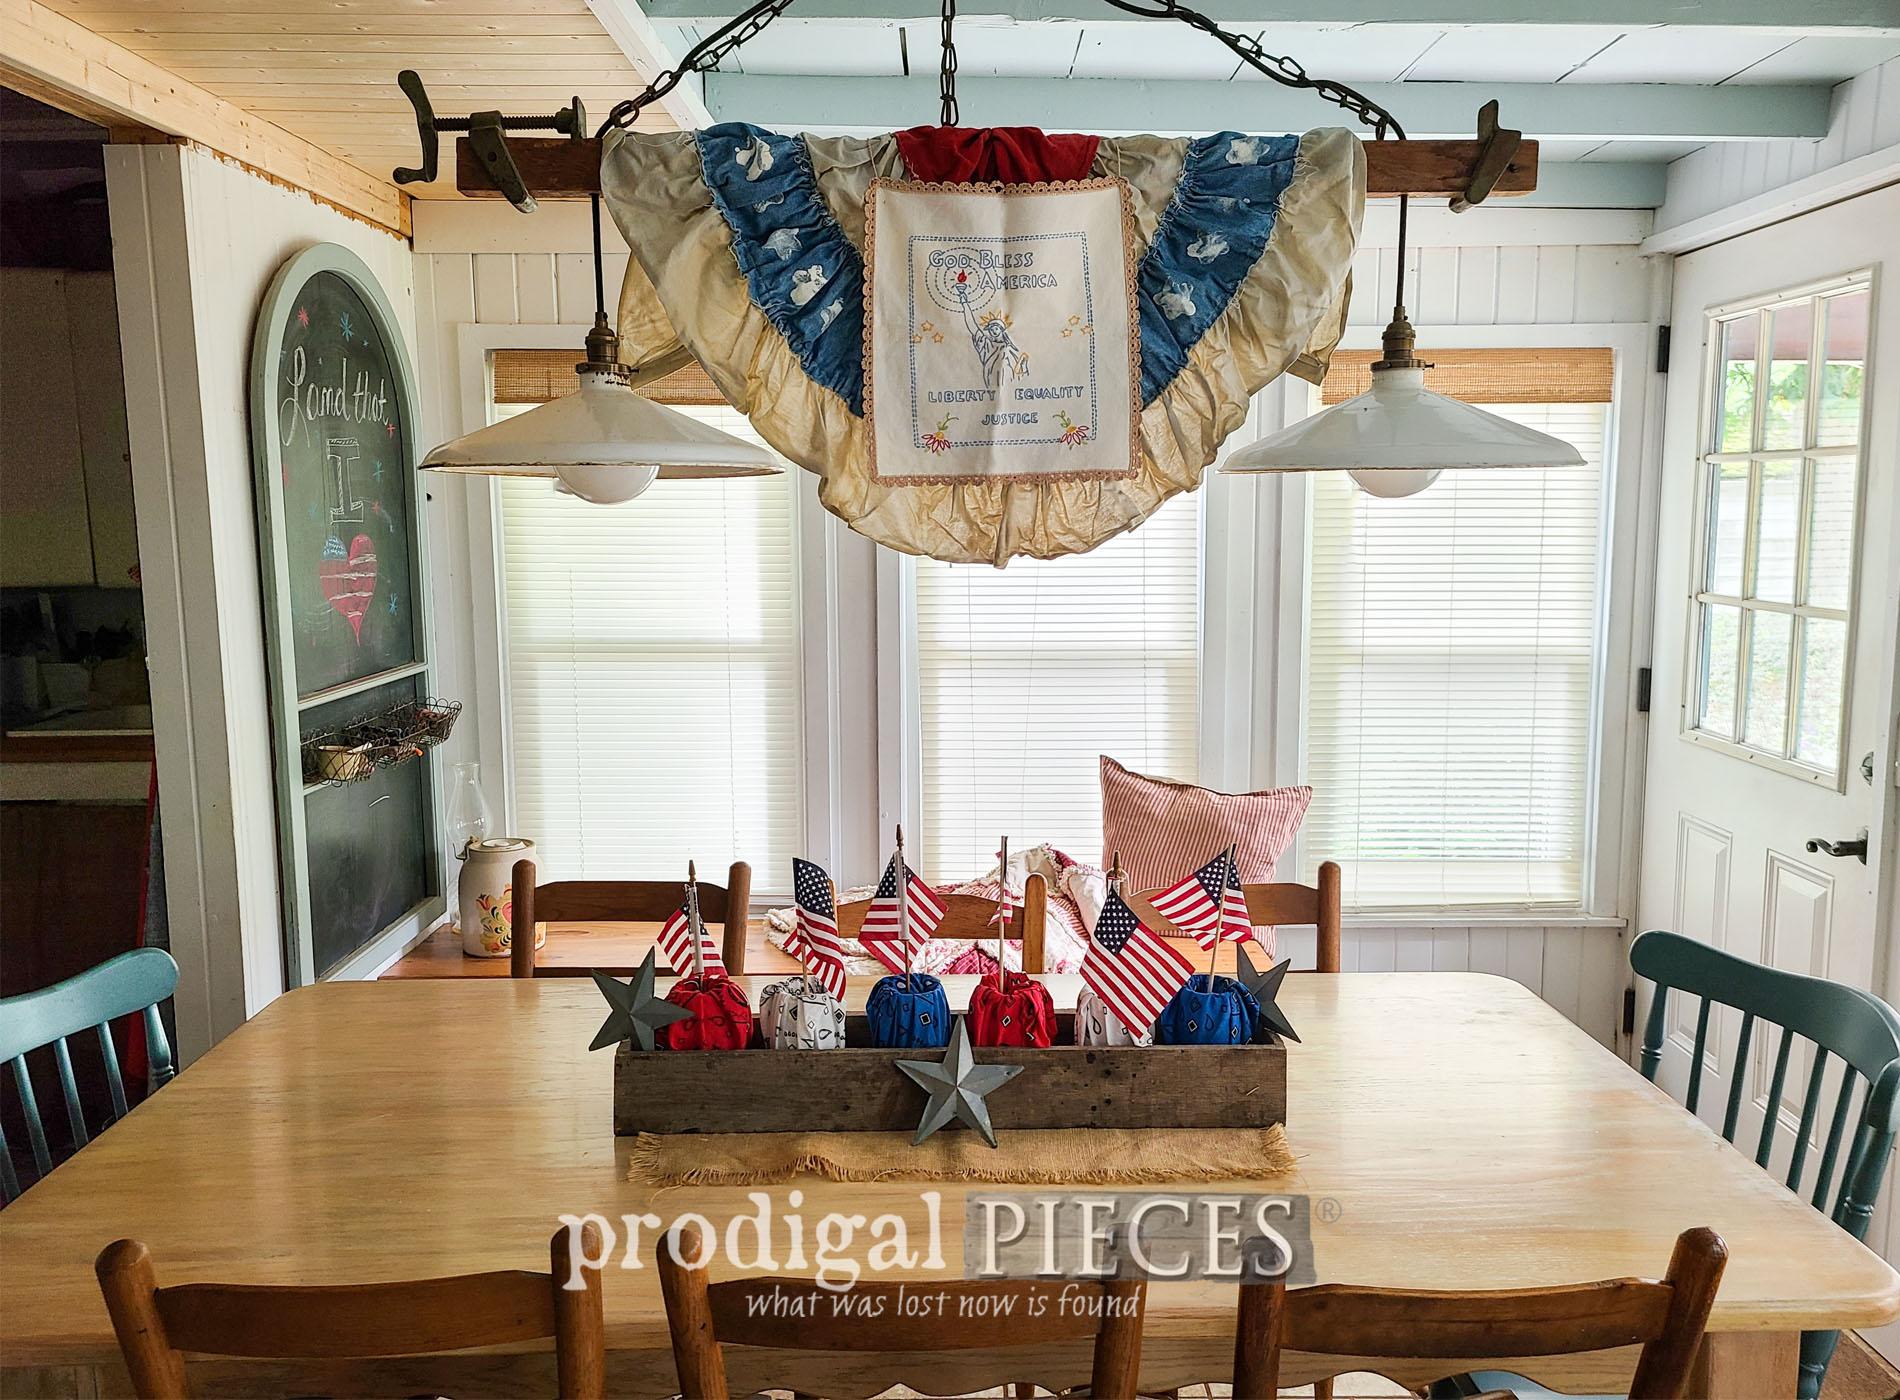 Featured Farmhouse Patriotic Decor Using Refashioned Bandanas | prodigalpieces.com #prodigalpieces #farmhouse #4thofjuly #independenceday #home #refashion